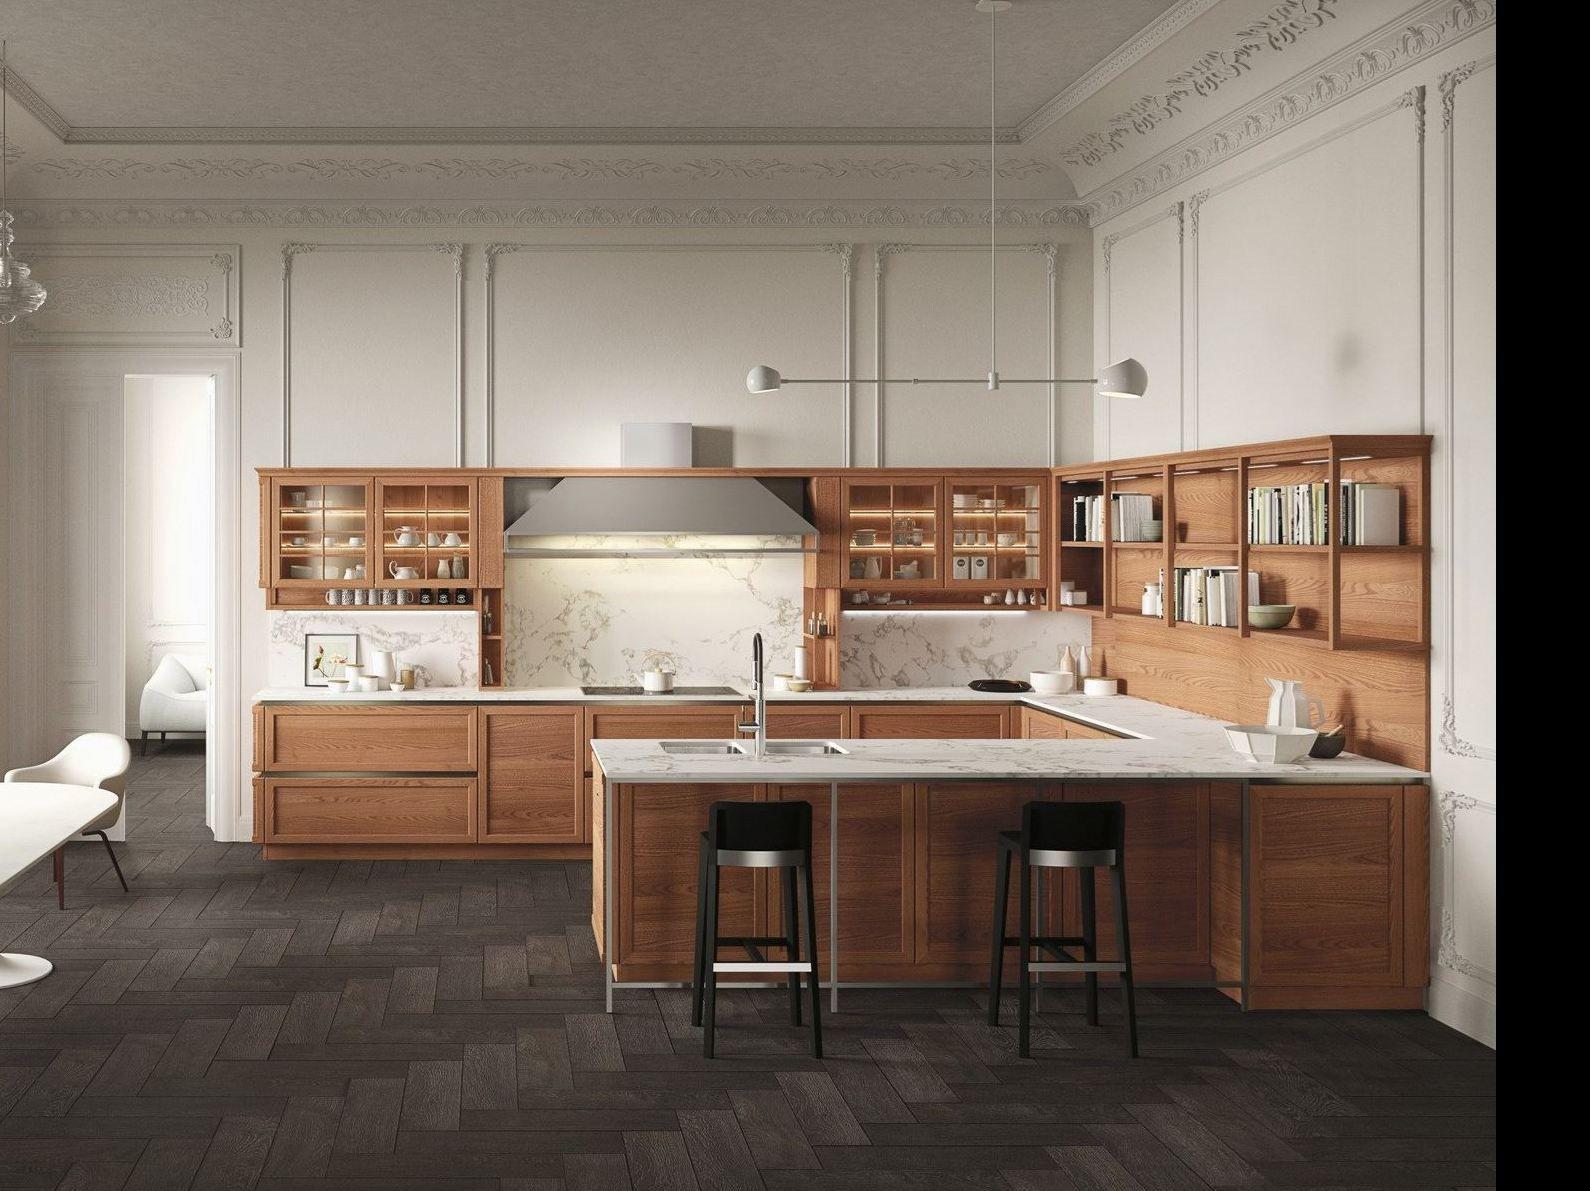 Heritage cuisine en bois by snaidero design massimo iosa ghini